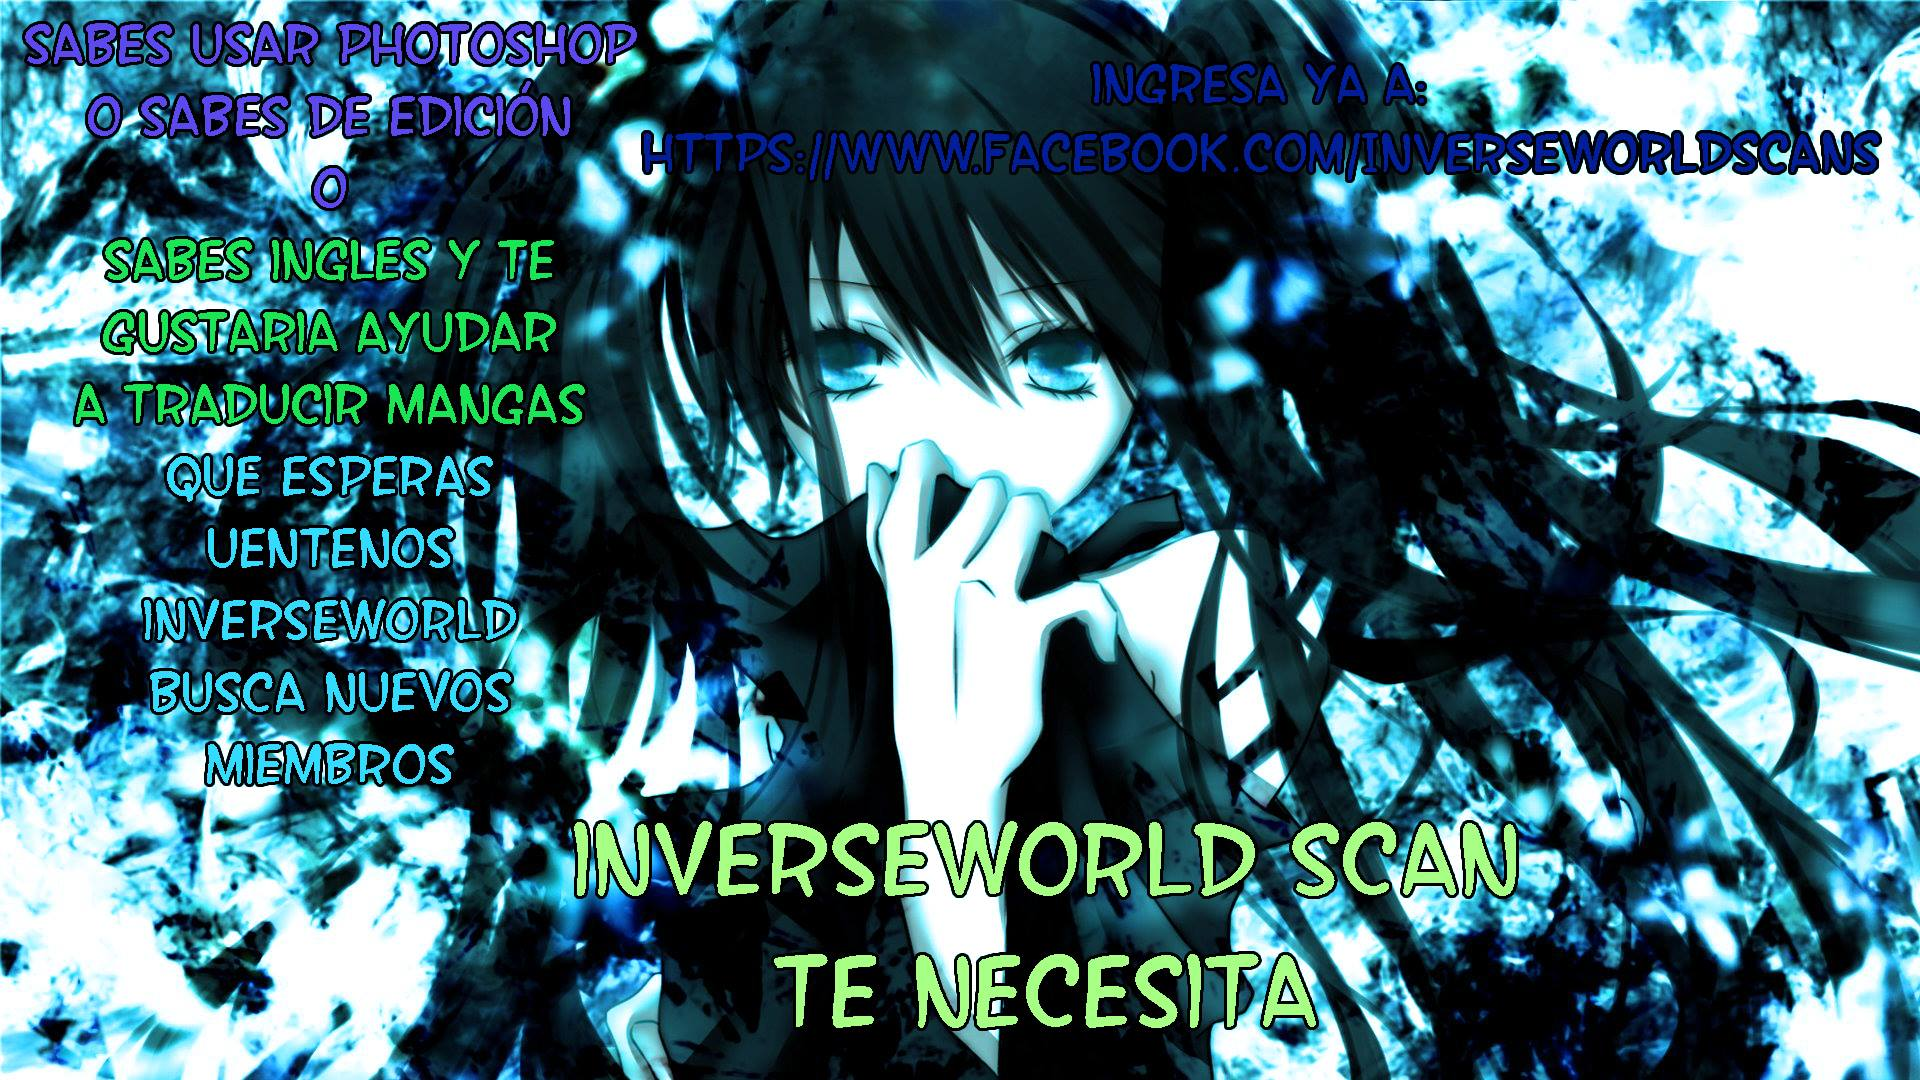 http://c5.ninemanga.com/es_manga/18/16210/415299/6b1d7eadb42d159909af05a7a6d88989.jpg Page 1